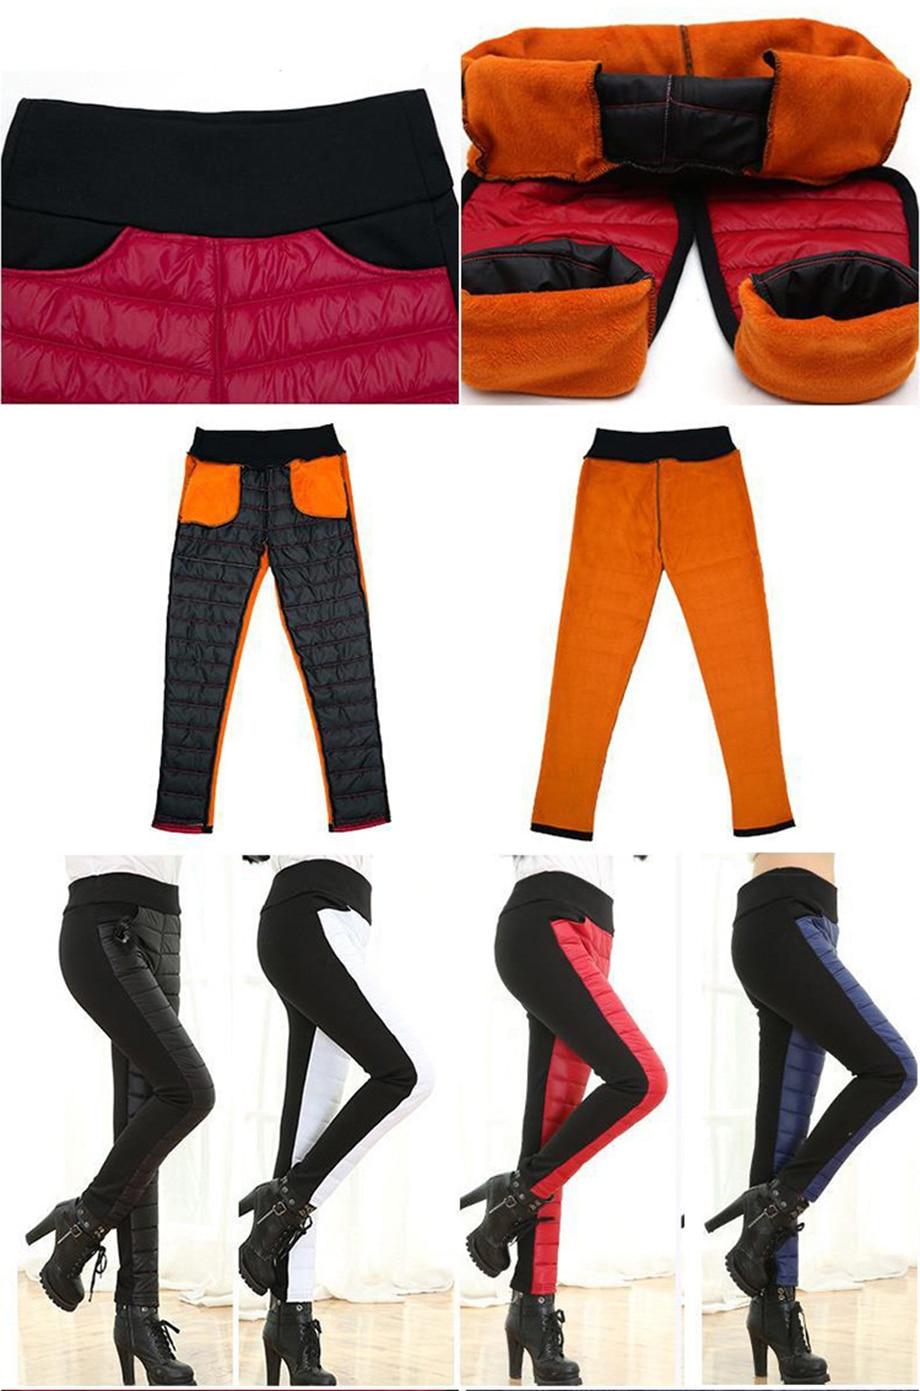 Thicken down Cotton Winter Warm Pants Women Elastic Waist Ladies Skinny Trousers Women's Casual Leggings Outwear Female Pants 15